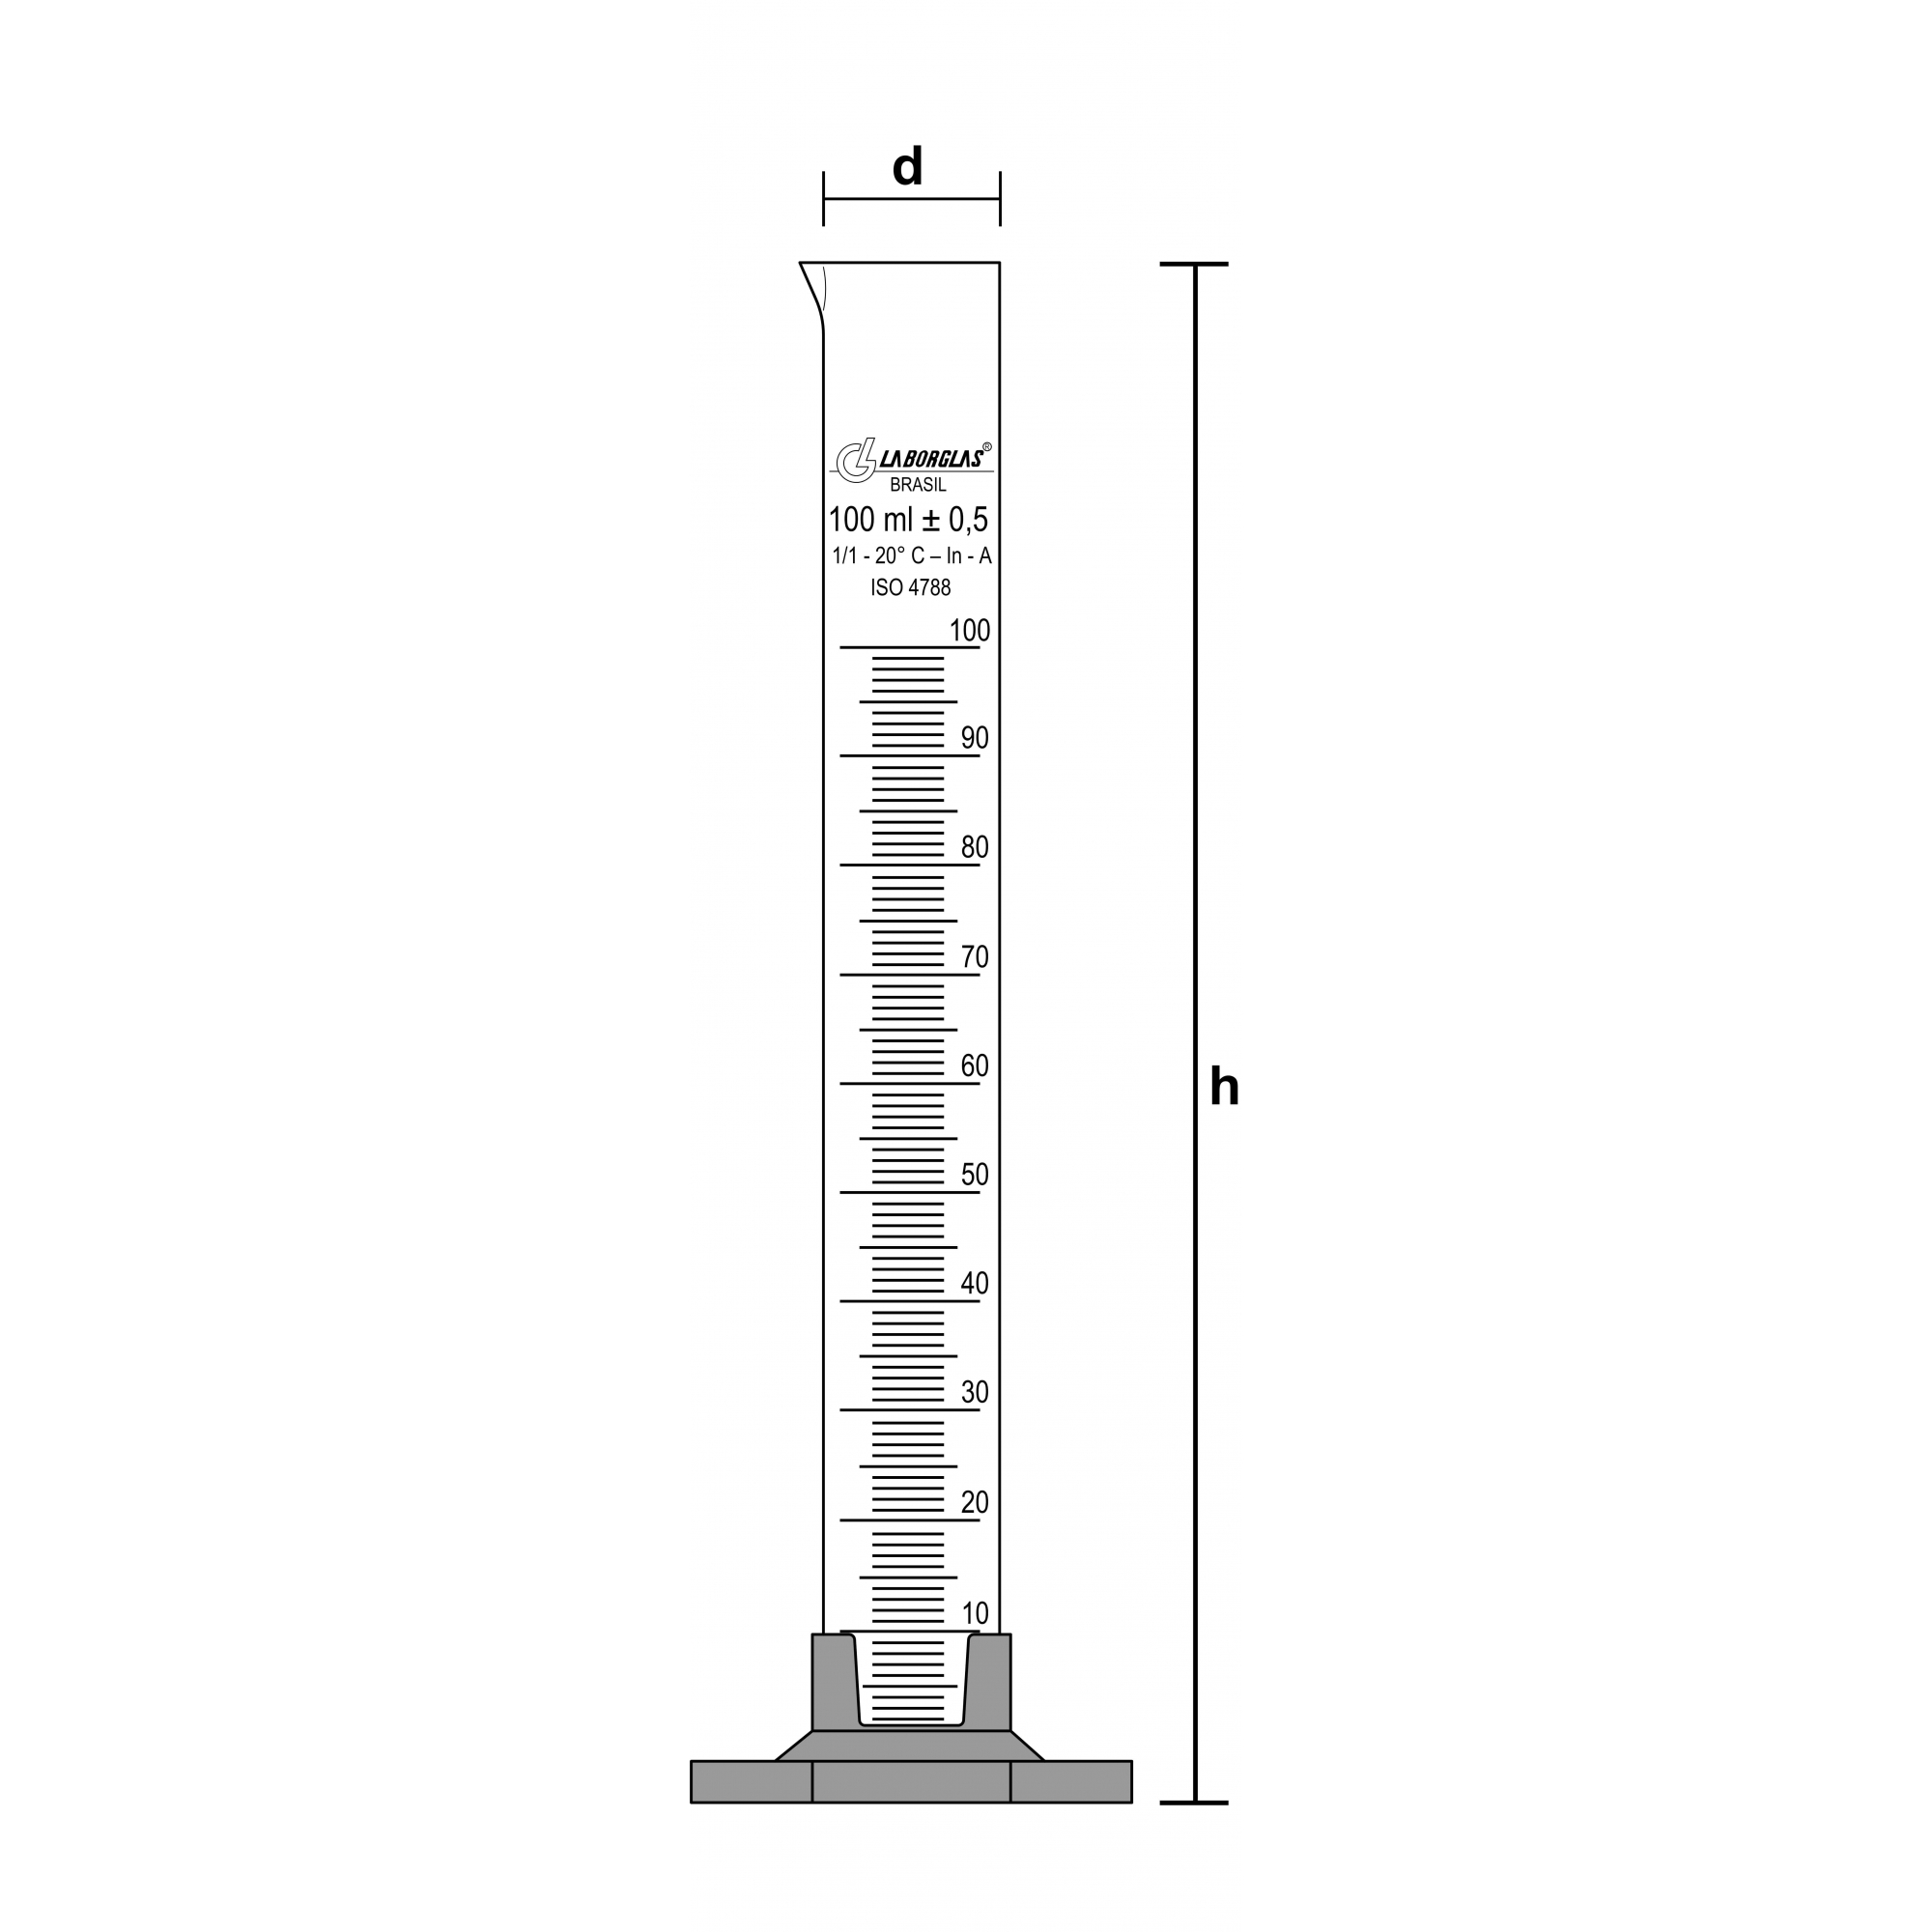 PROVETA GRADUADA BASE HEXAGONAL DE POLIPROPILENO 25 ML CLASSE A CERTIFICADO RBC - Laborglas - Cód. 9138714-R